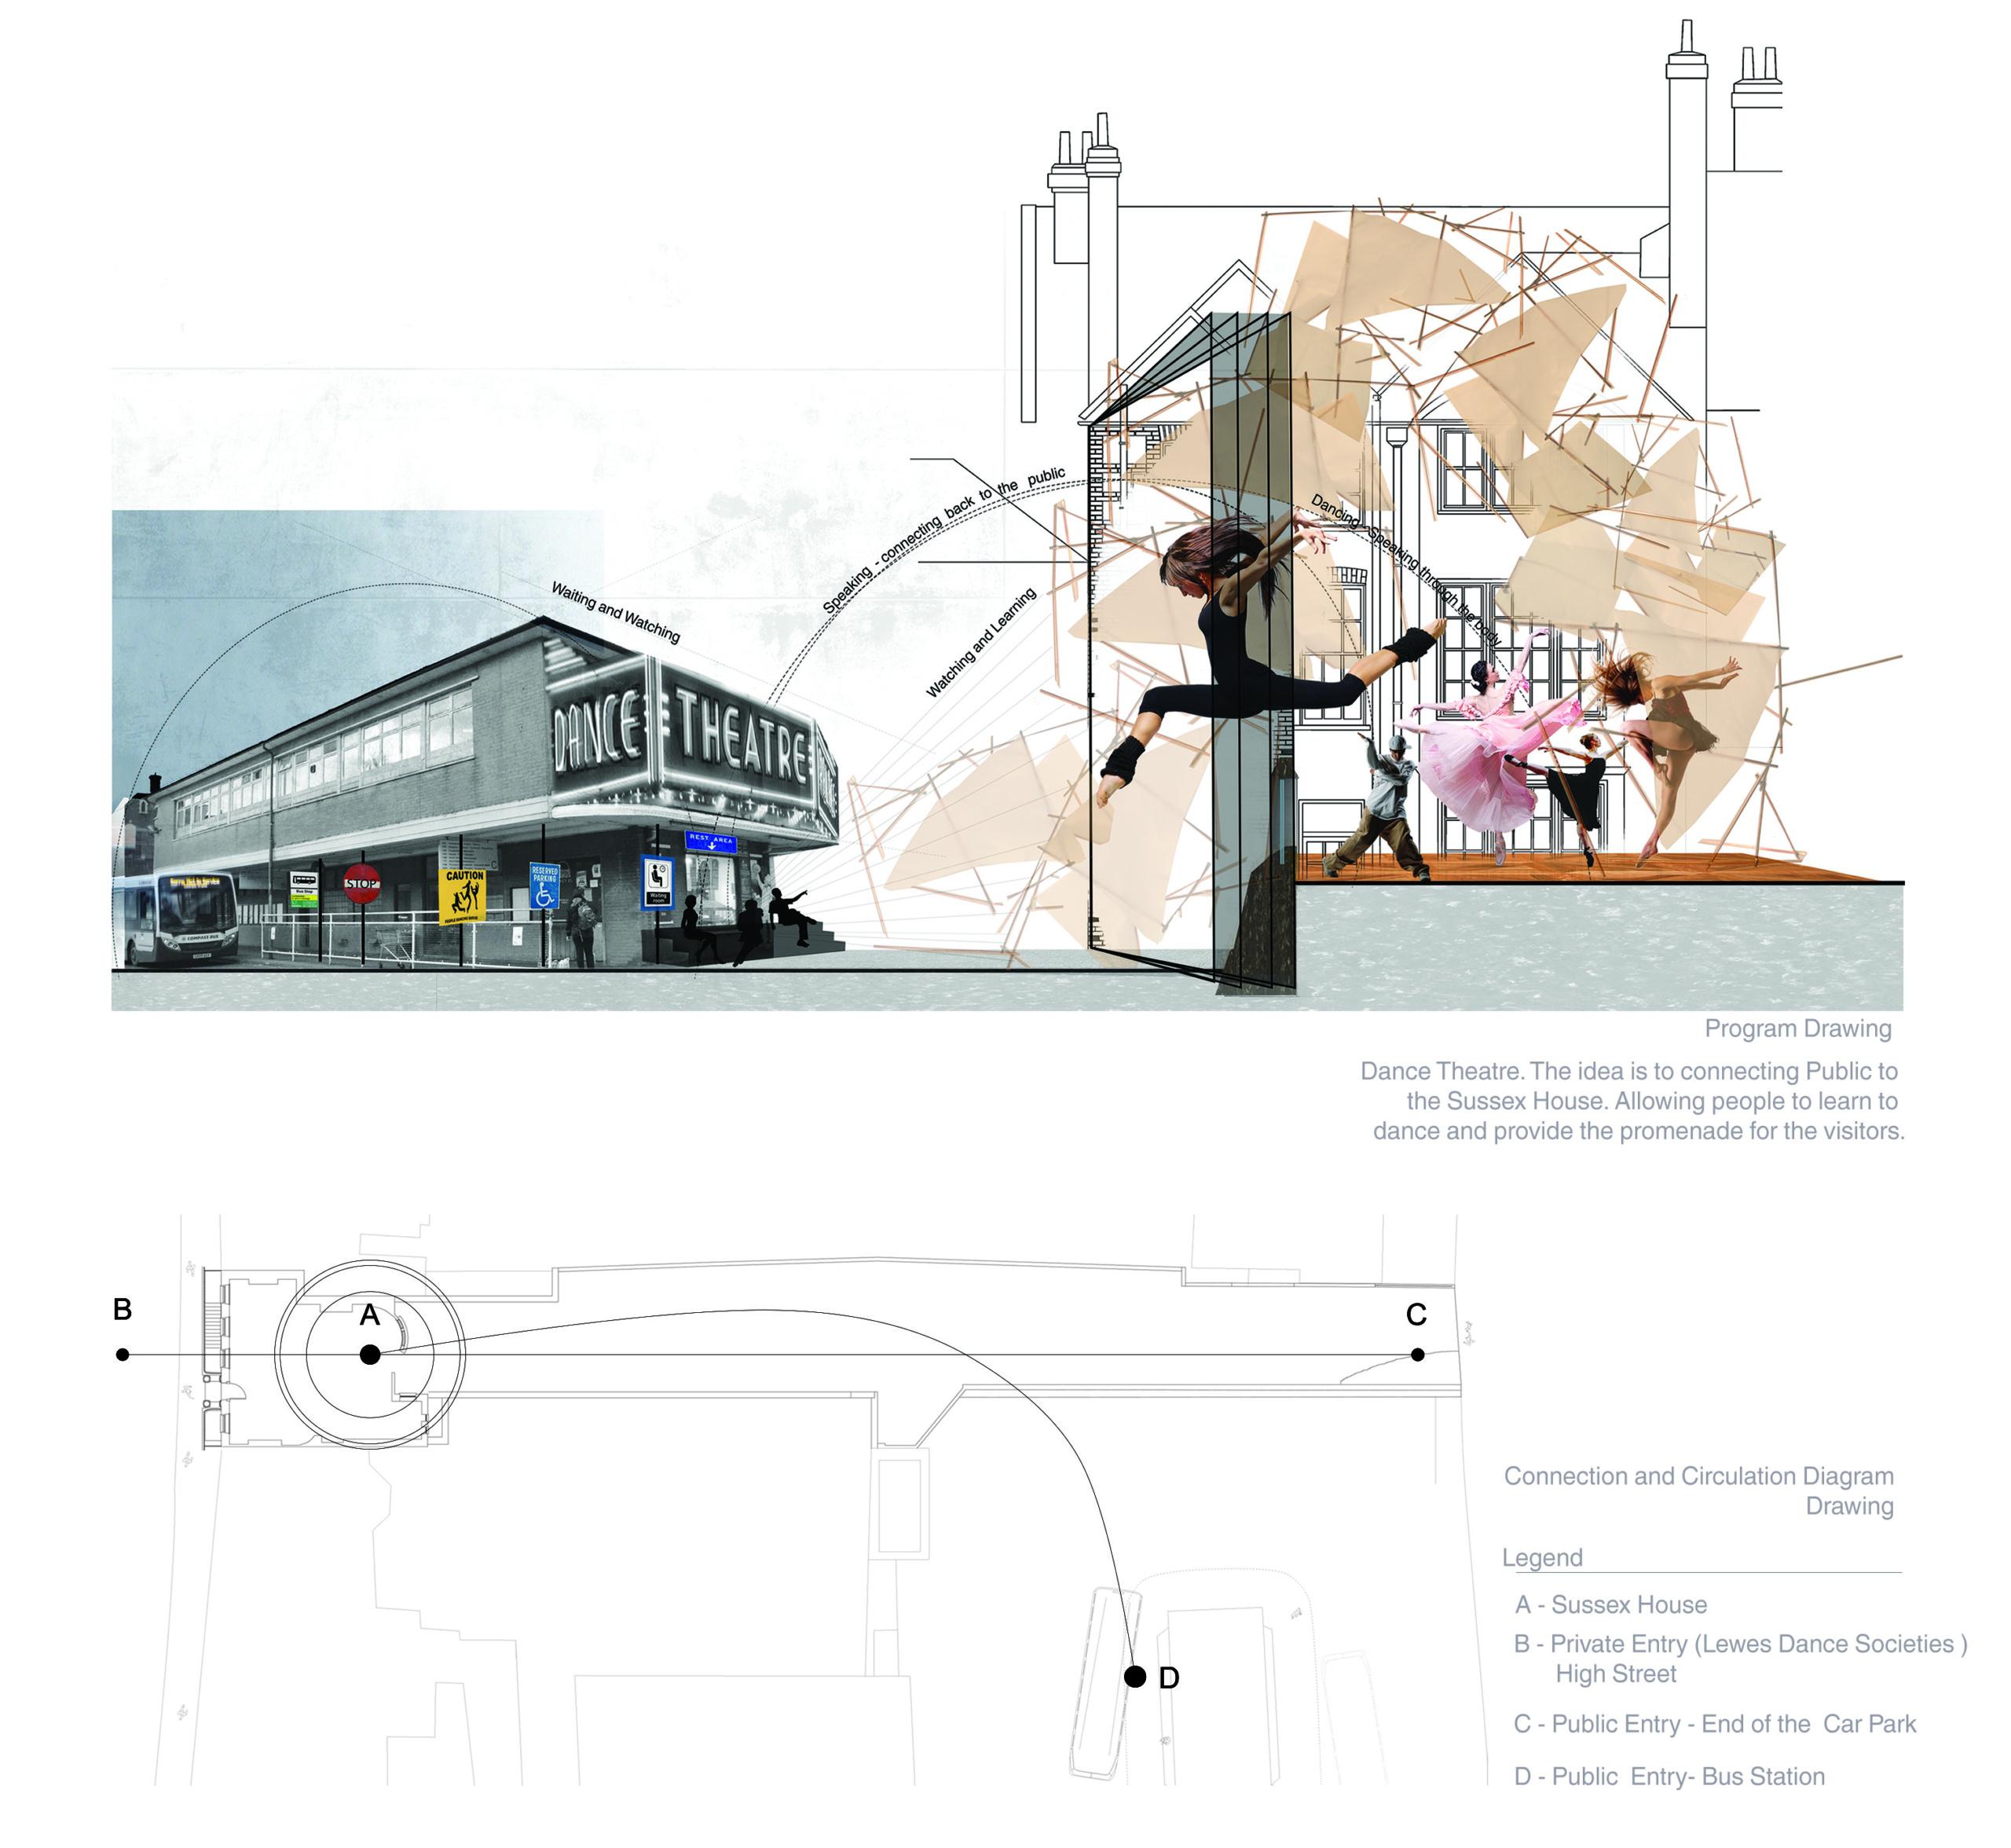 ana_sidorova technology-Dance Theatre Lewes town (18)